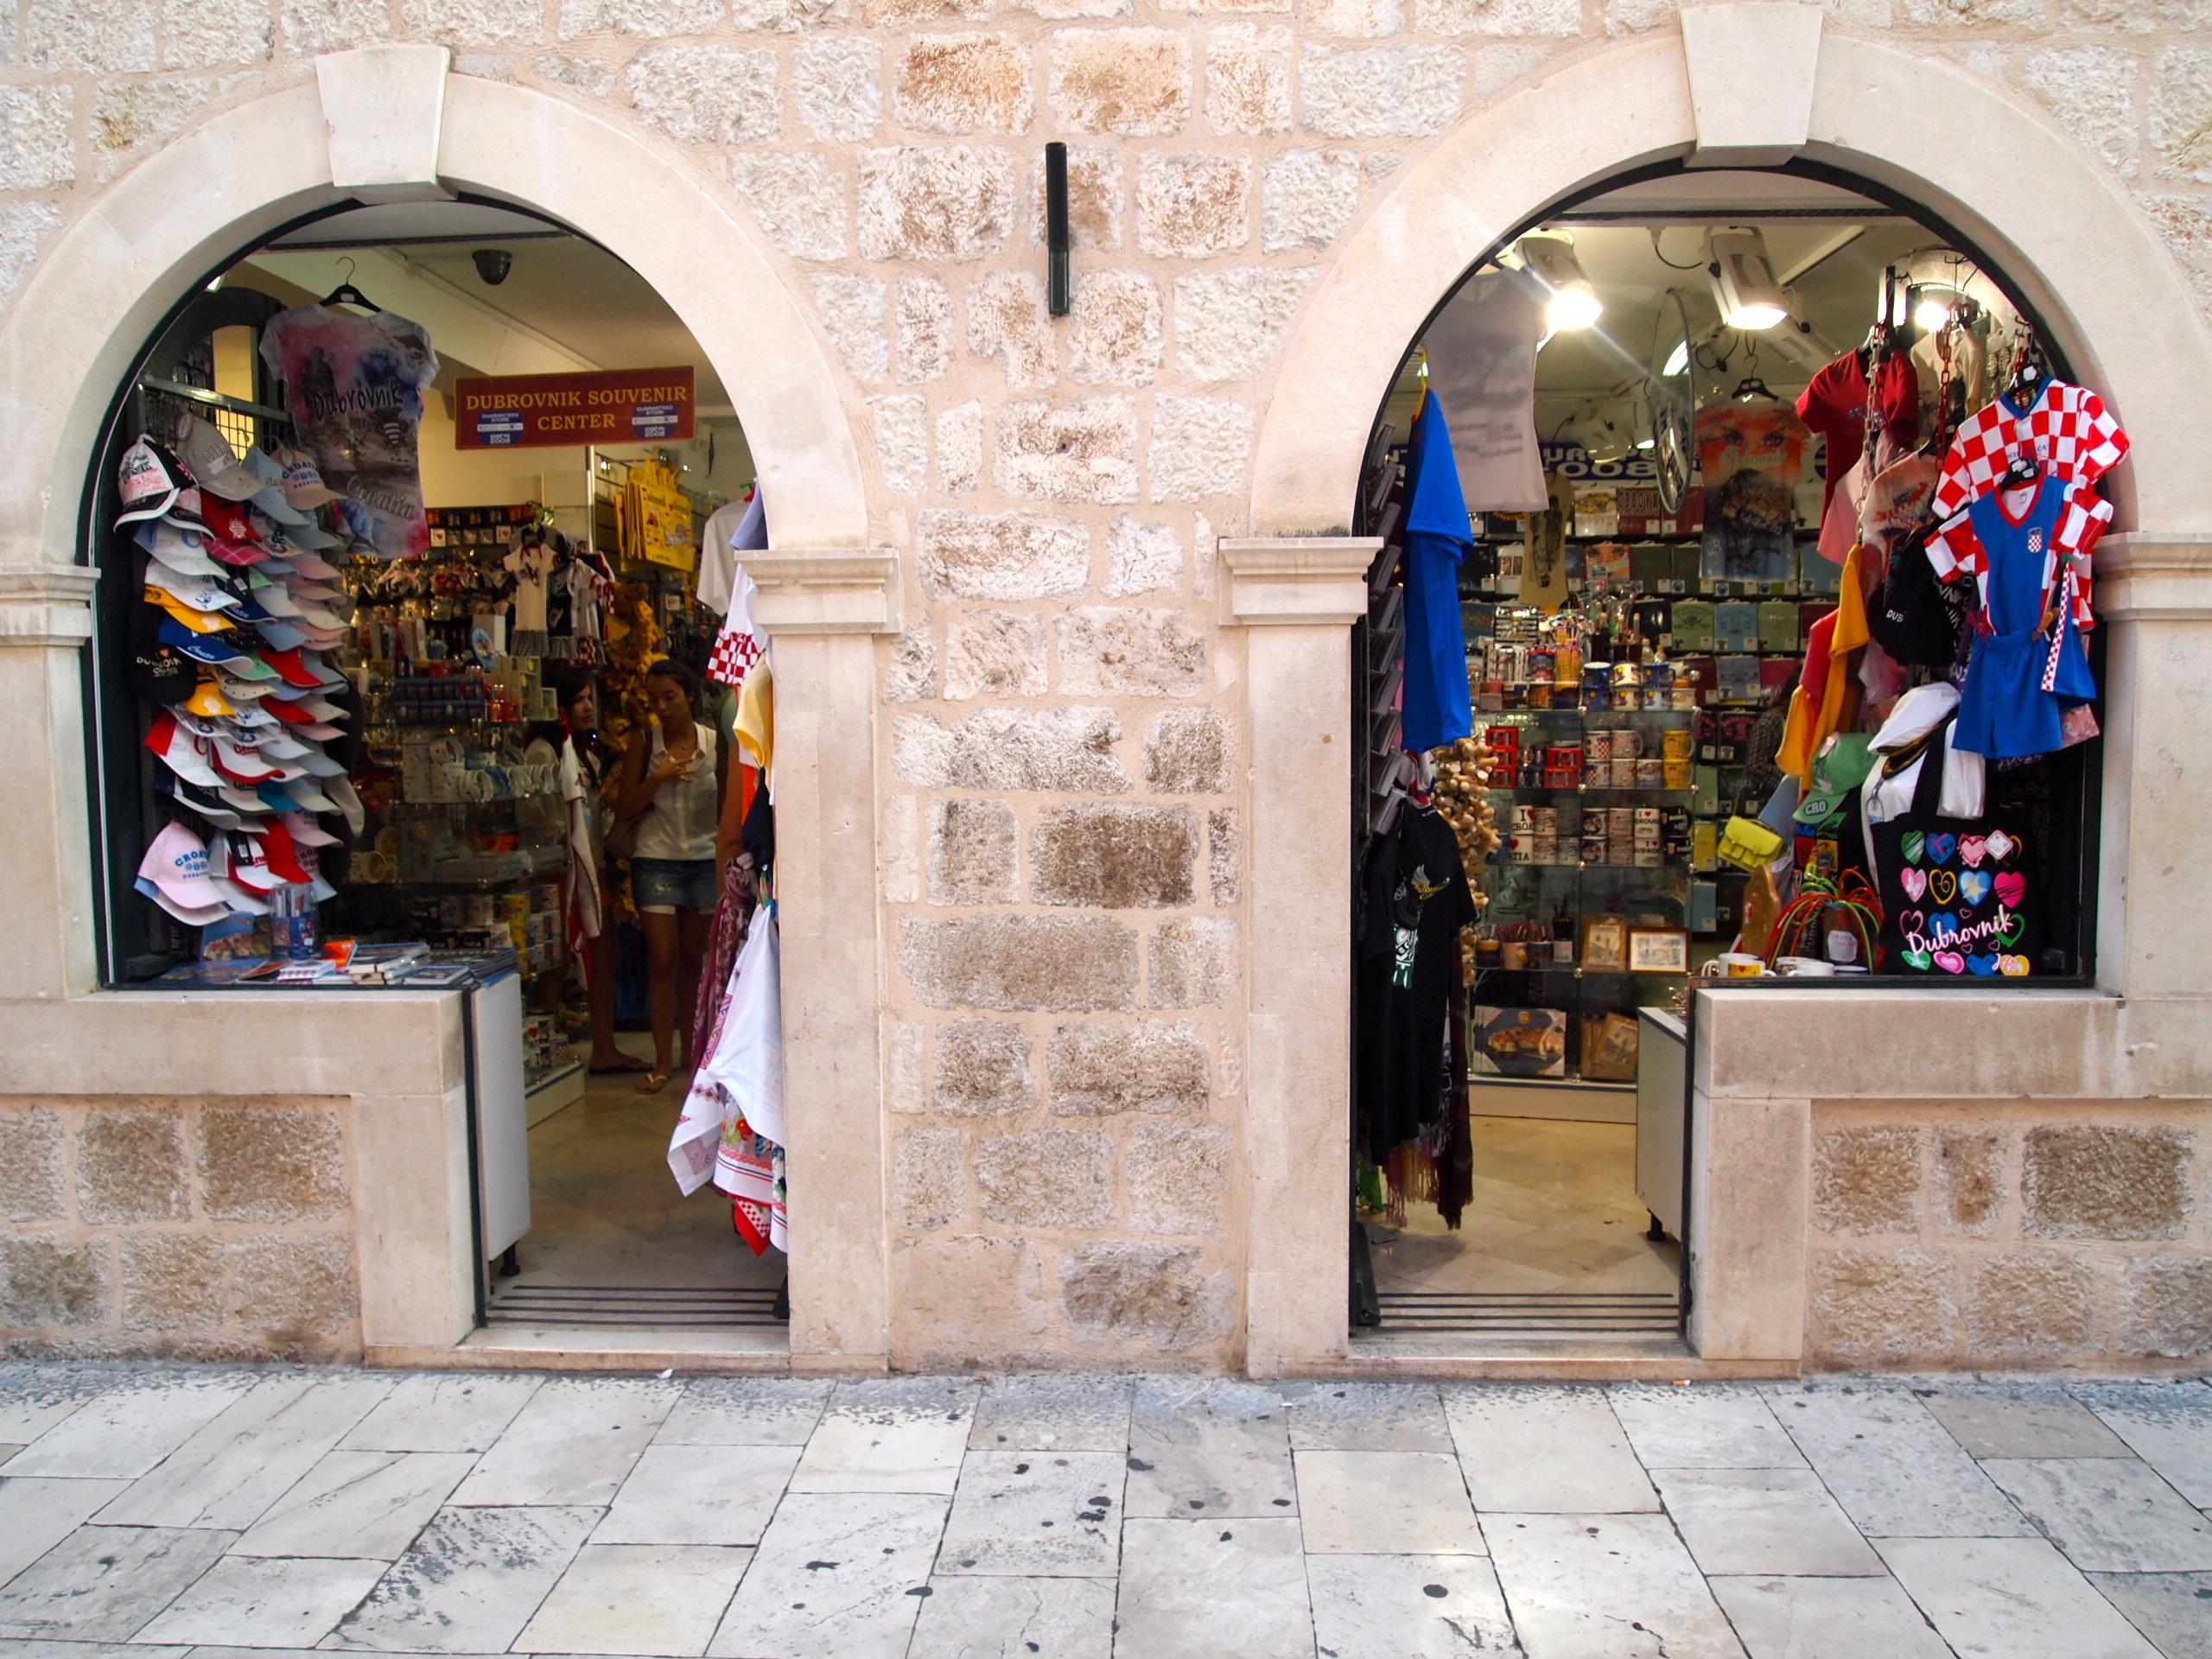 Stradun shops front